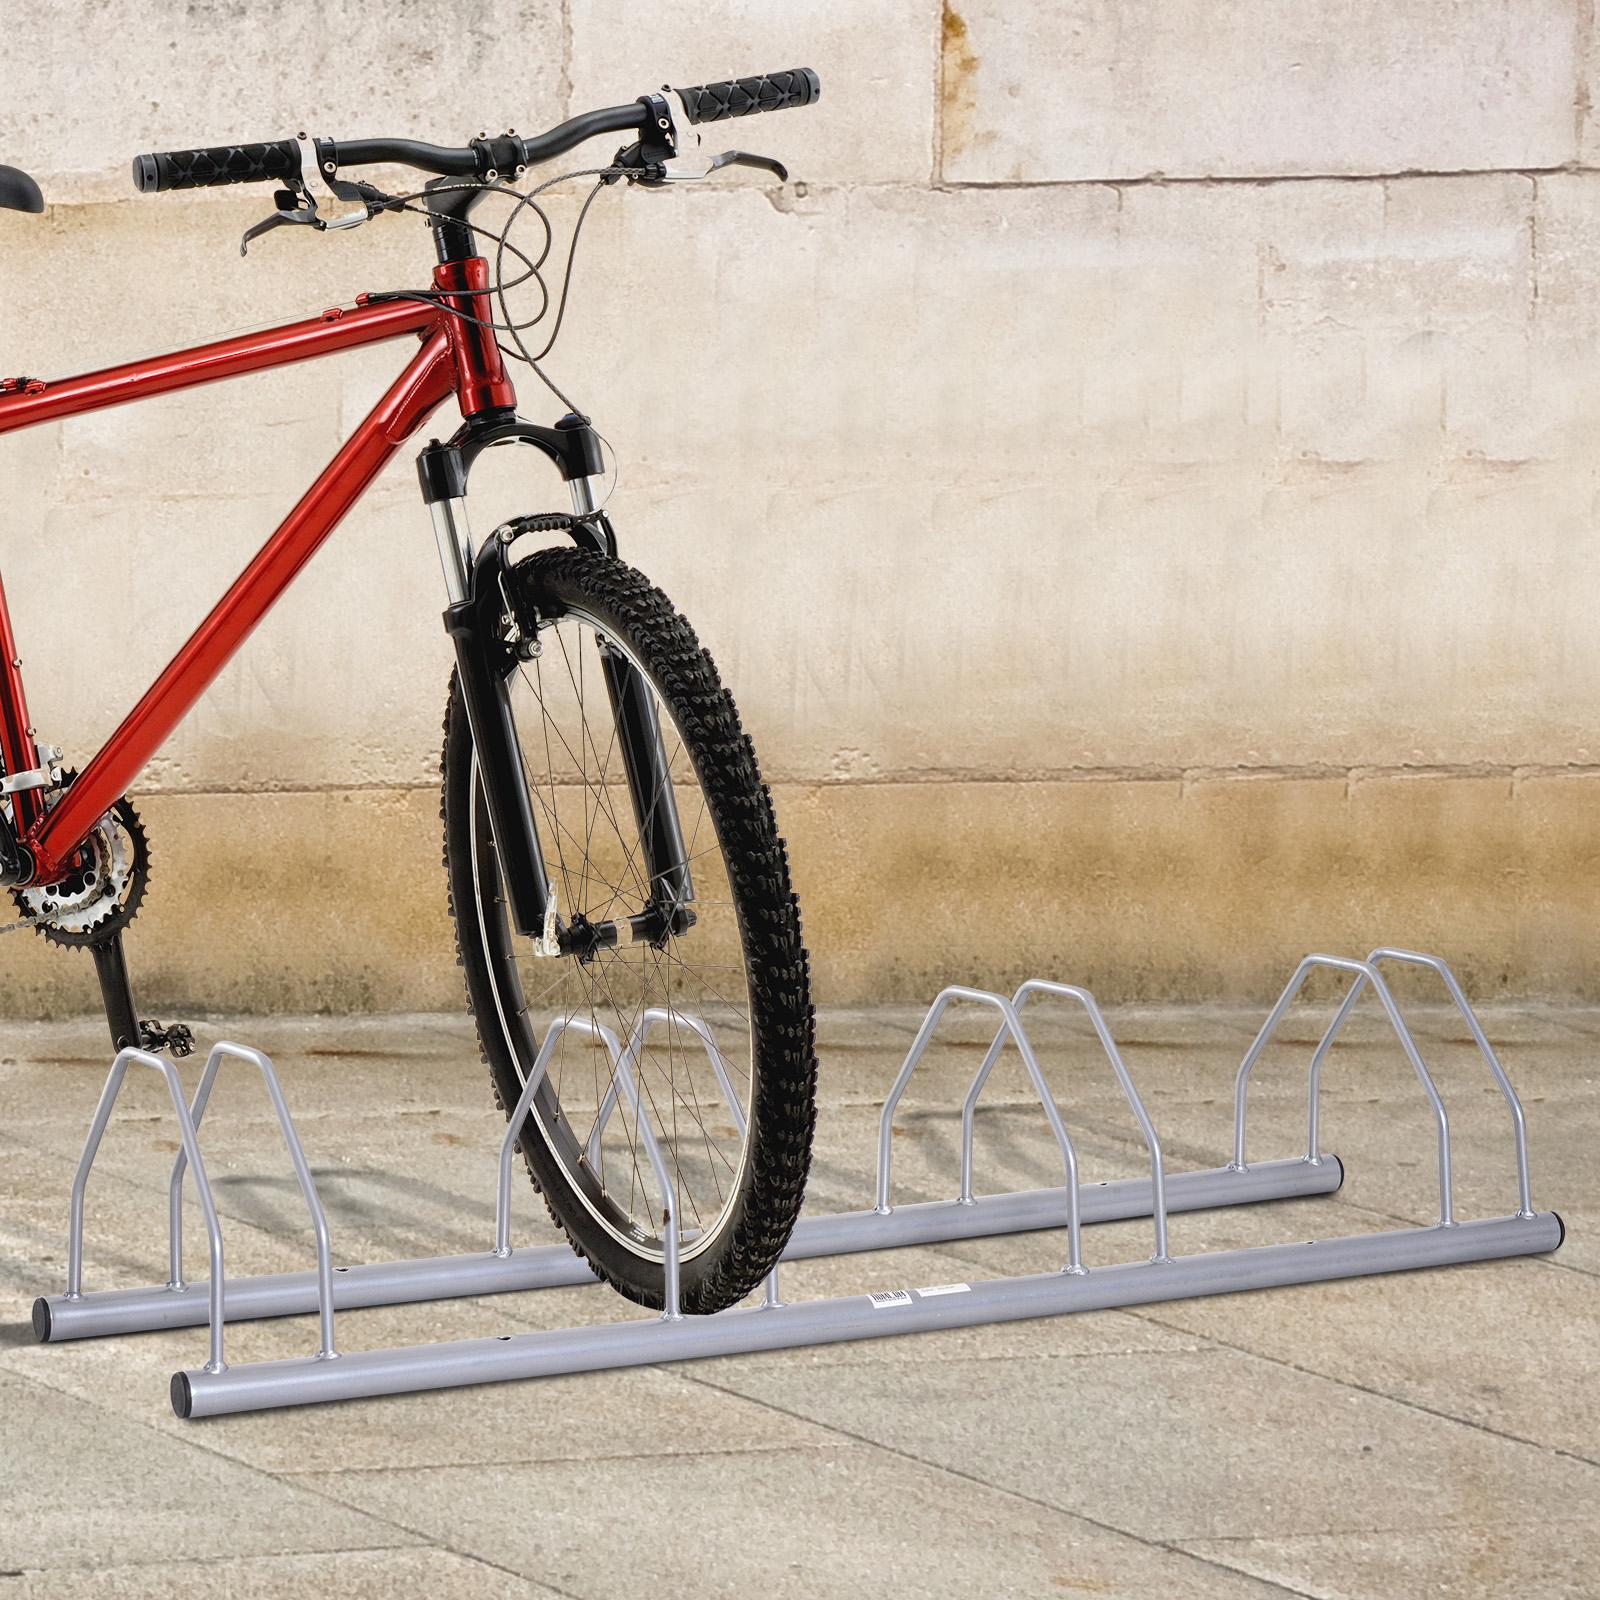 Fahrradständer Mehrfachständer Bodenständer Aufstellständer Fahrradparker 3Räder